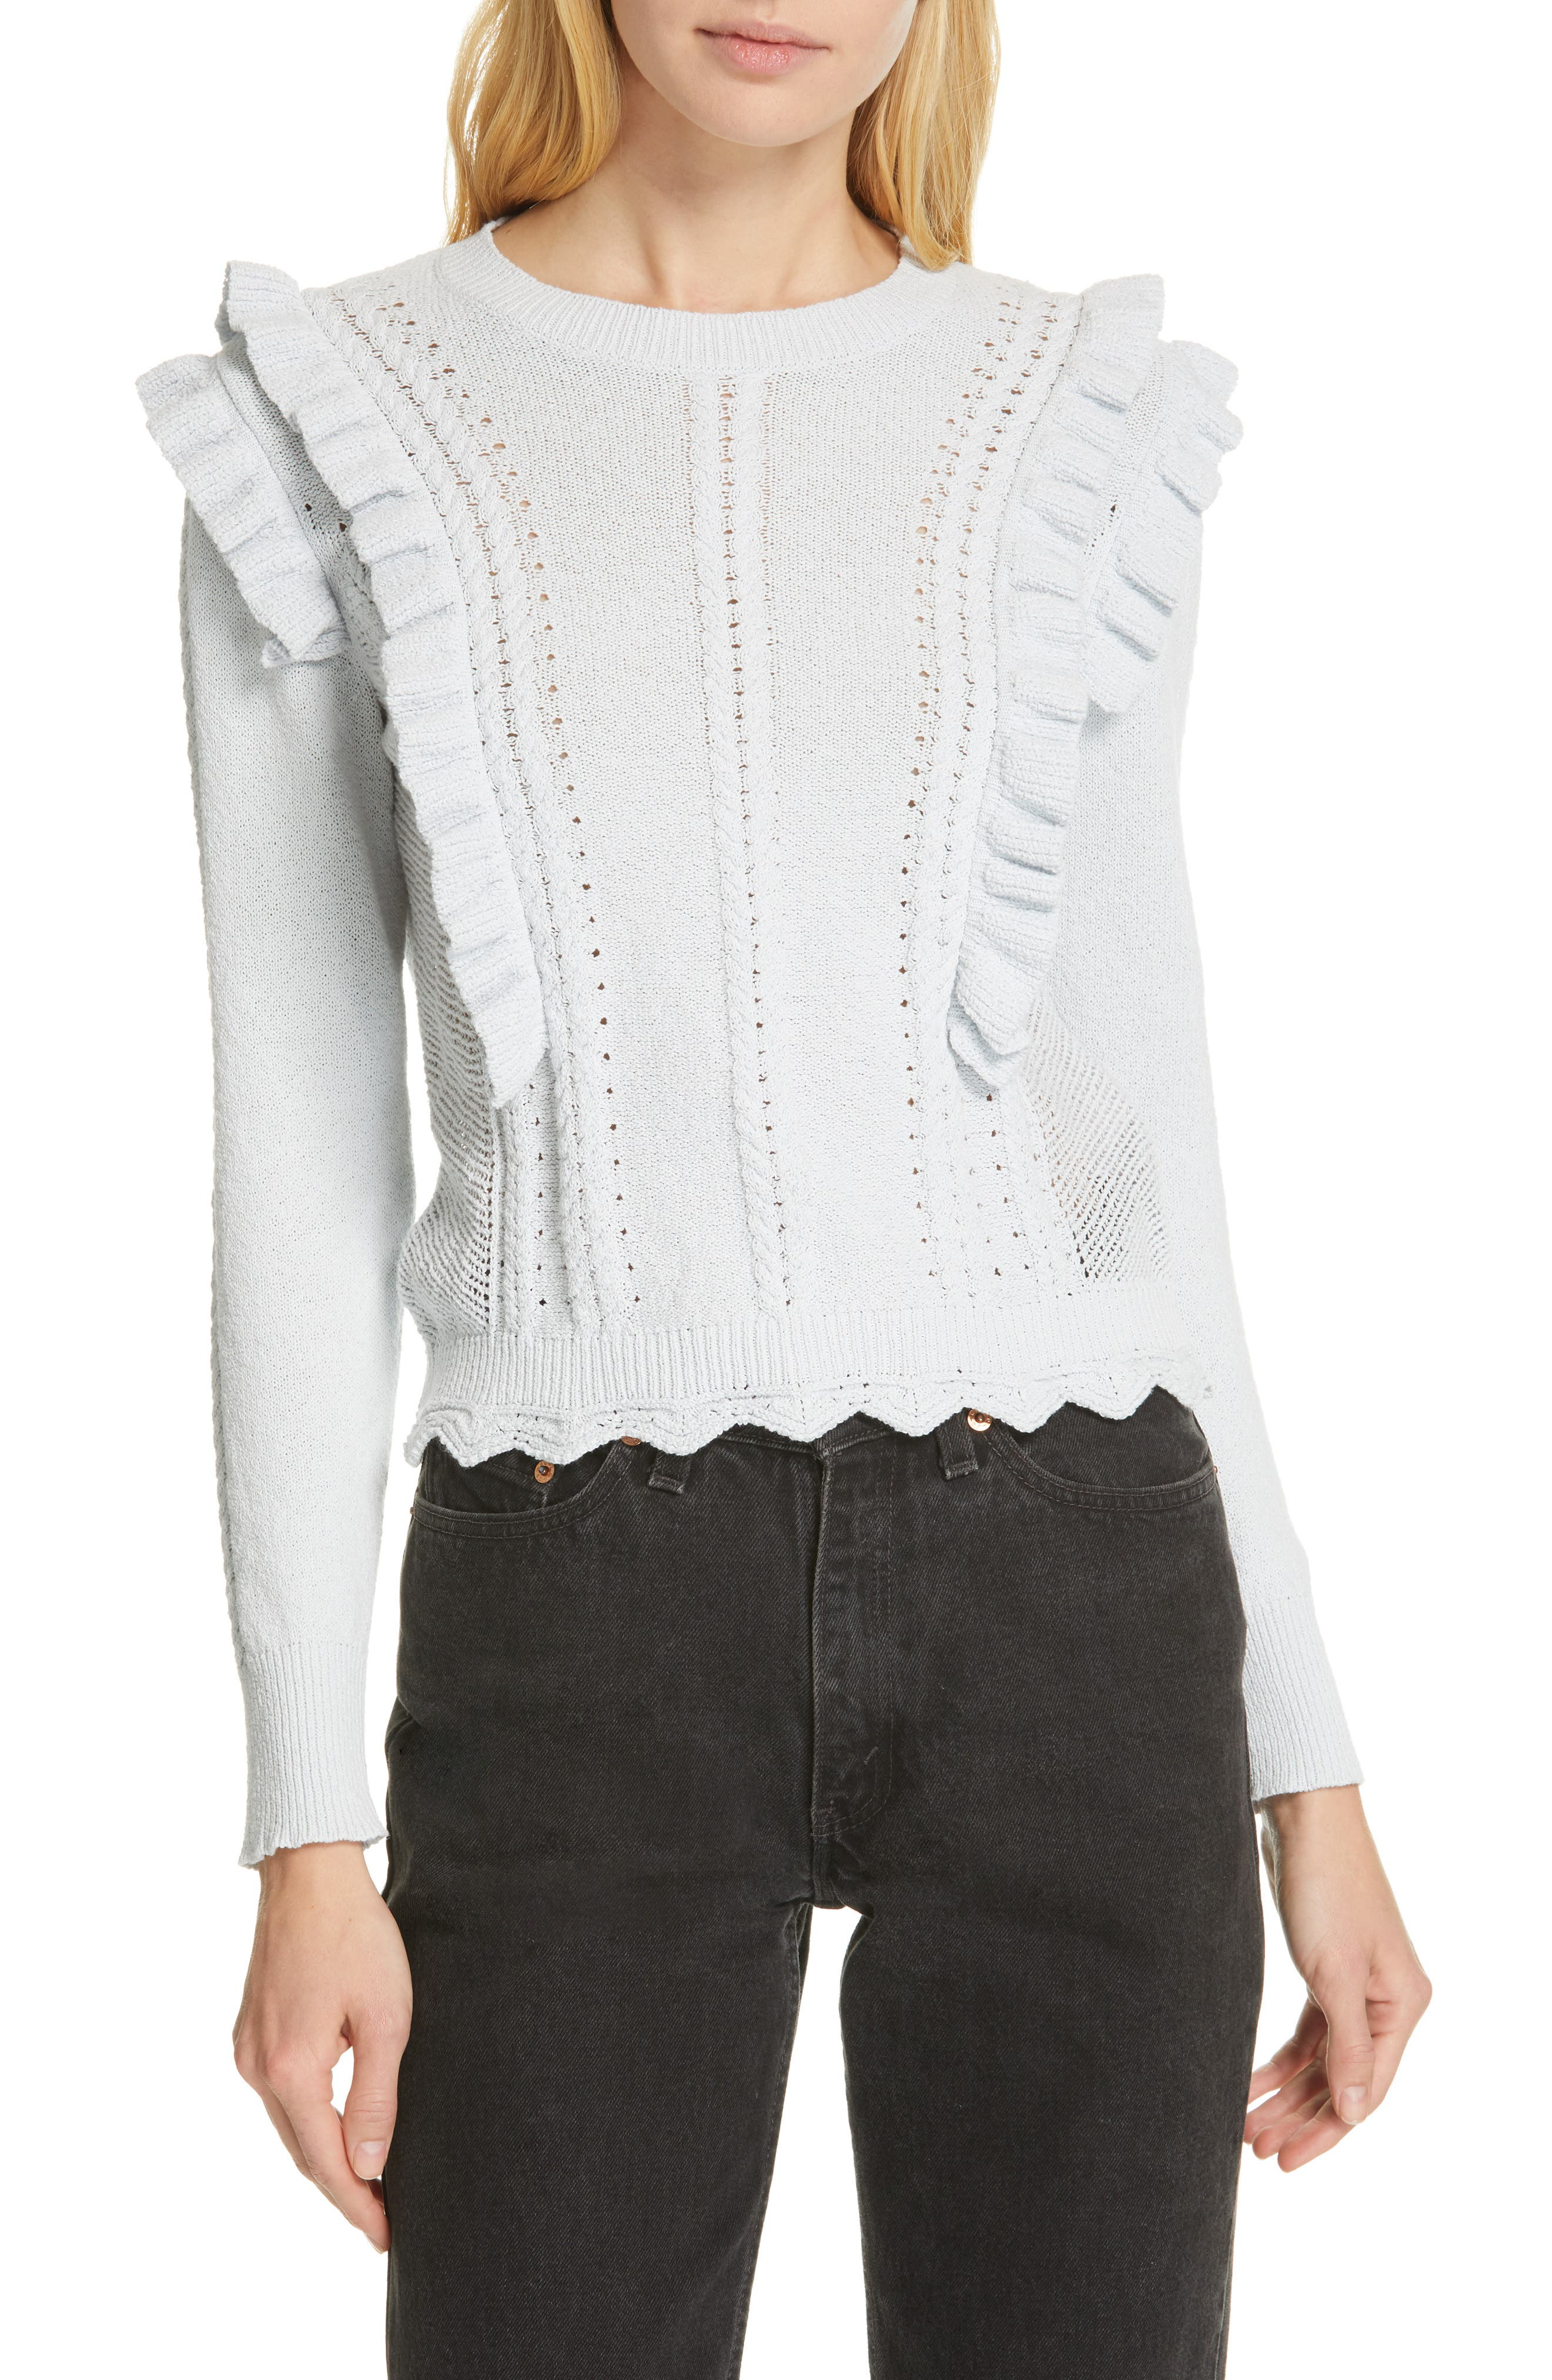 REBECCA TAYLOR Ruffled Sweater, Main, color, LIGHT MINT